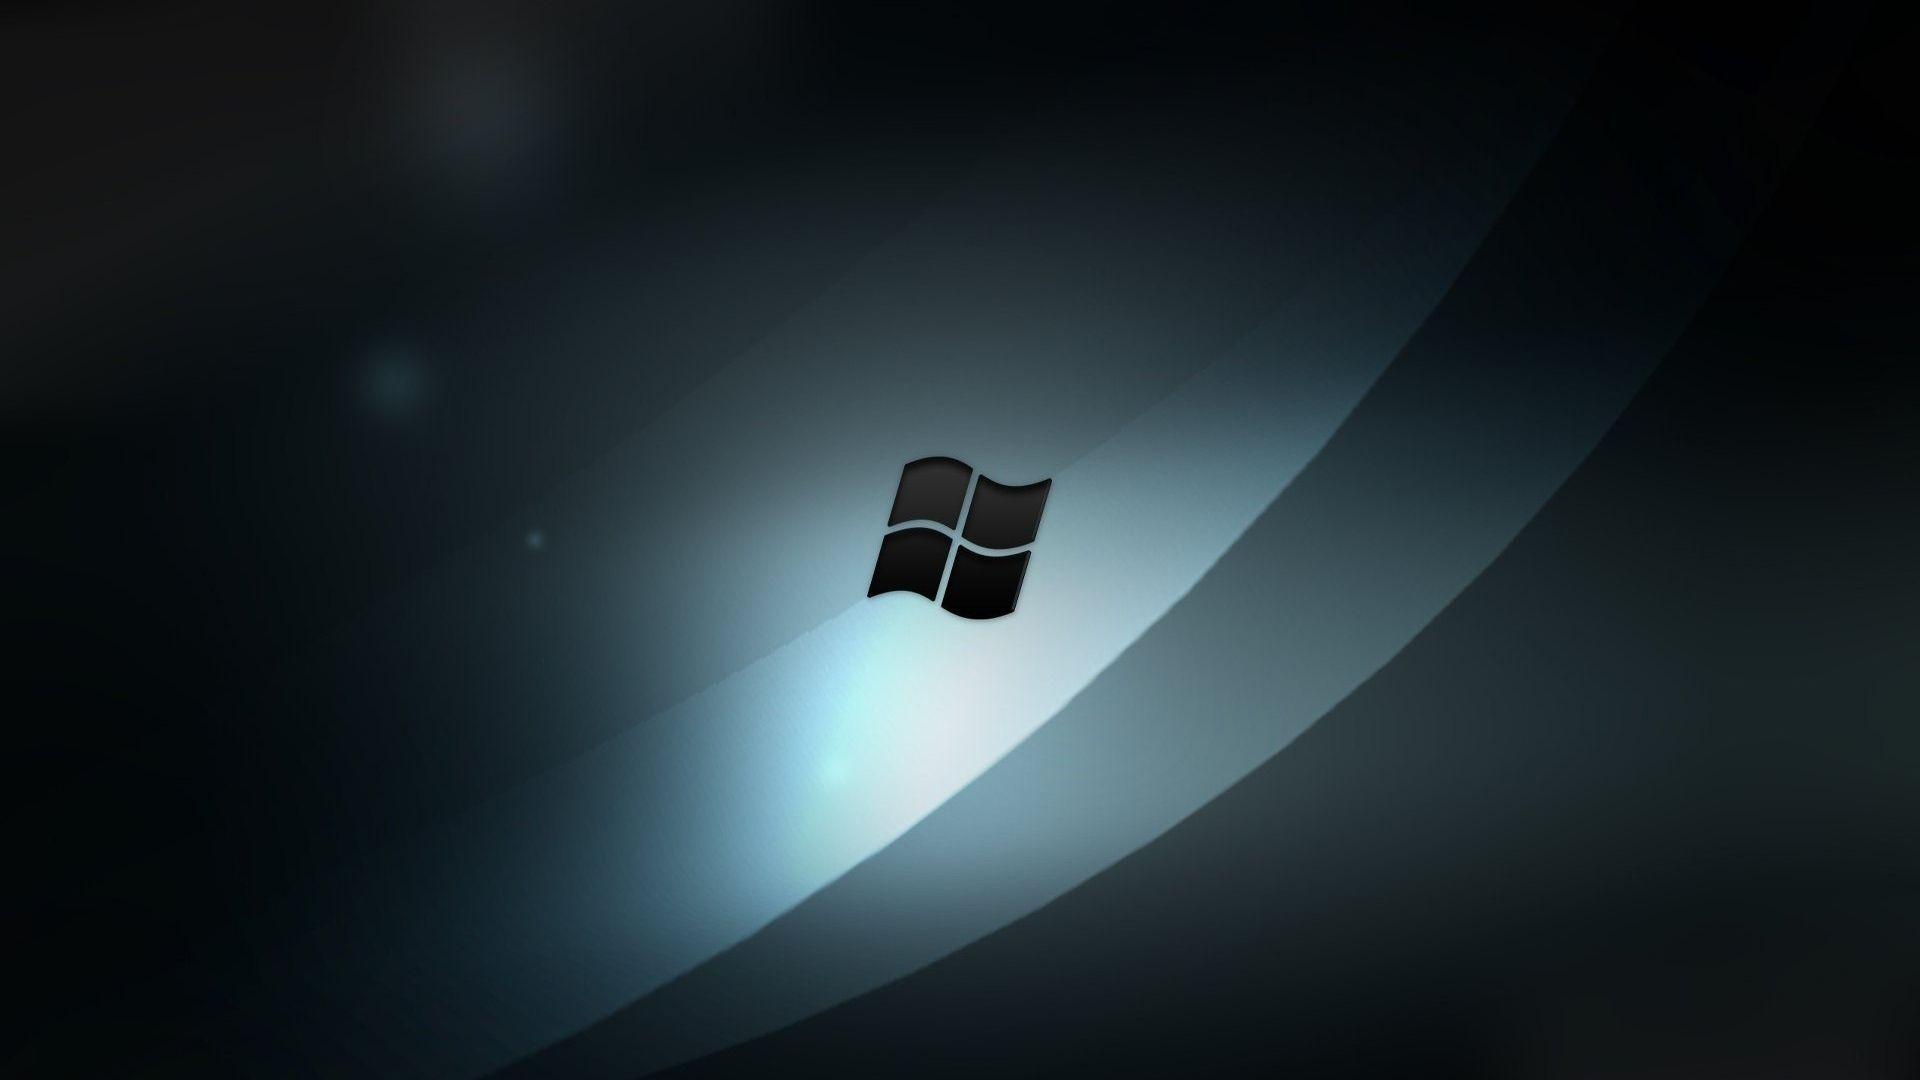 Microsoft Windows Wallpaper HD Amazing Wallpaperz 1920×1080